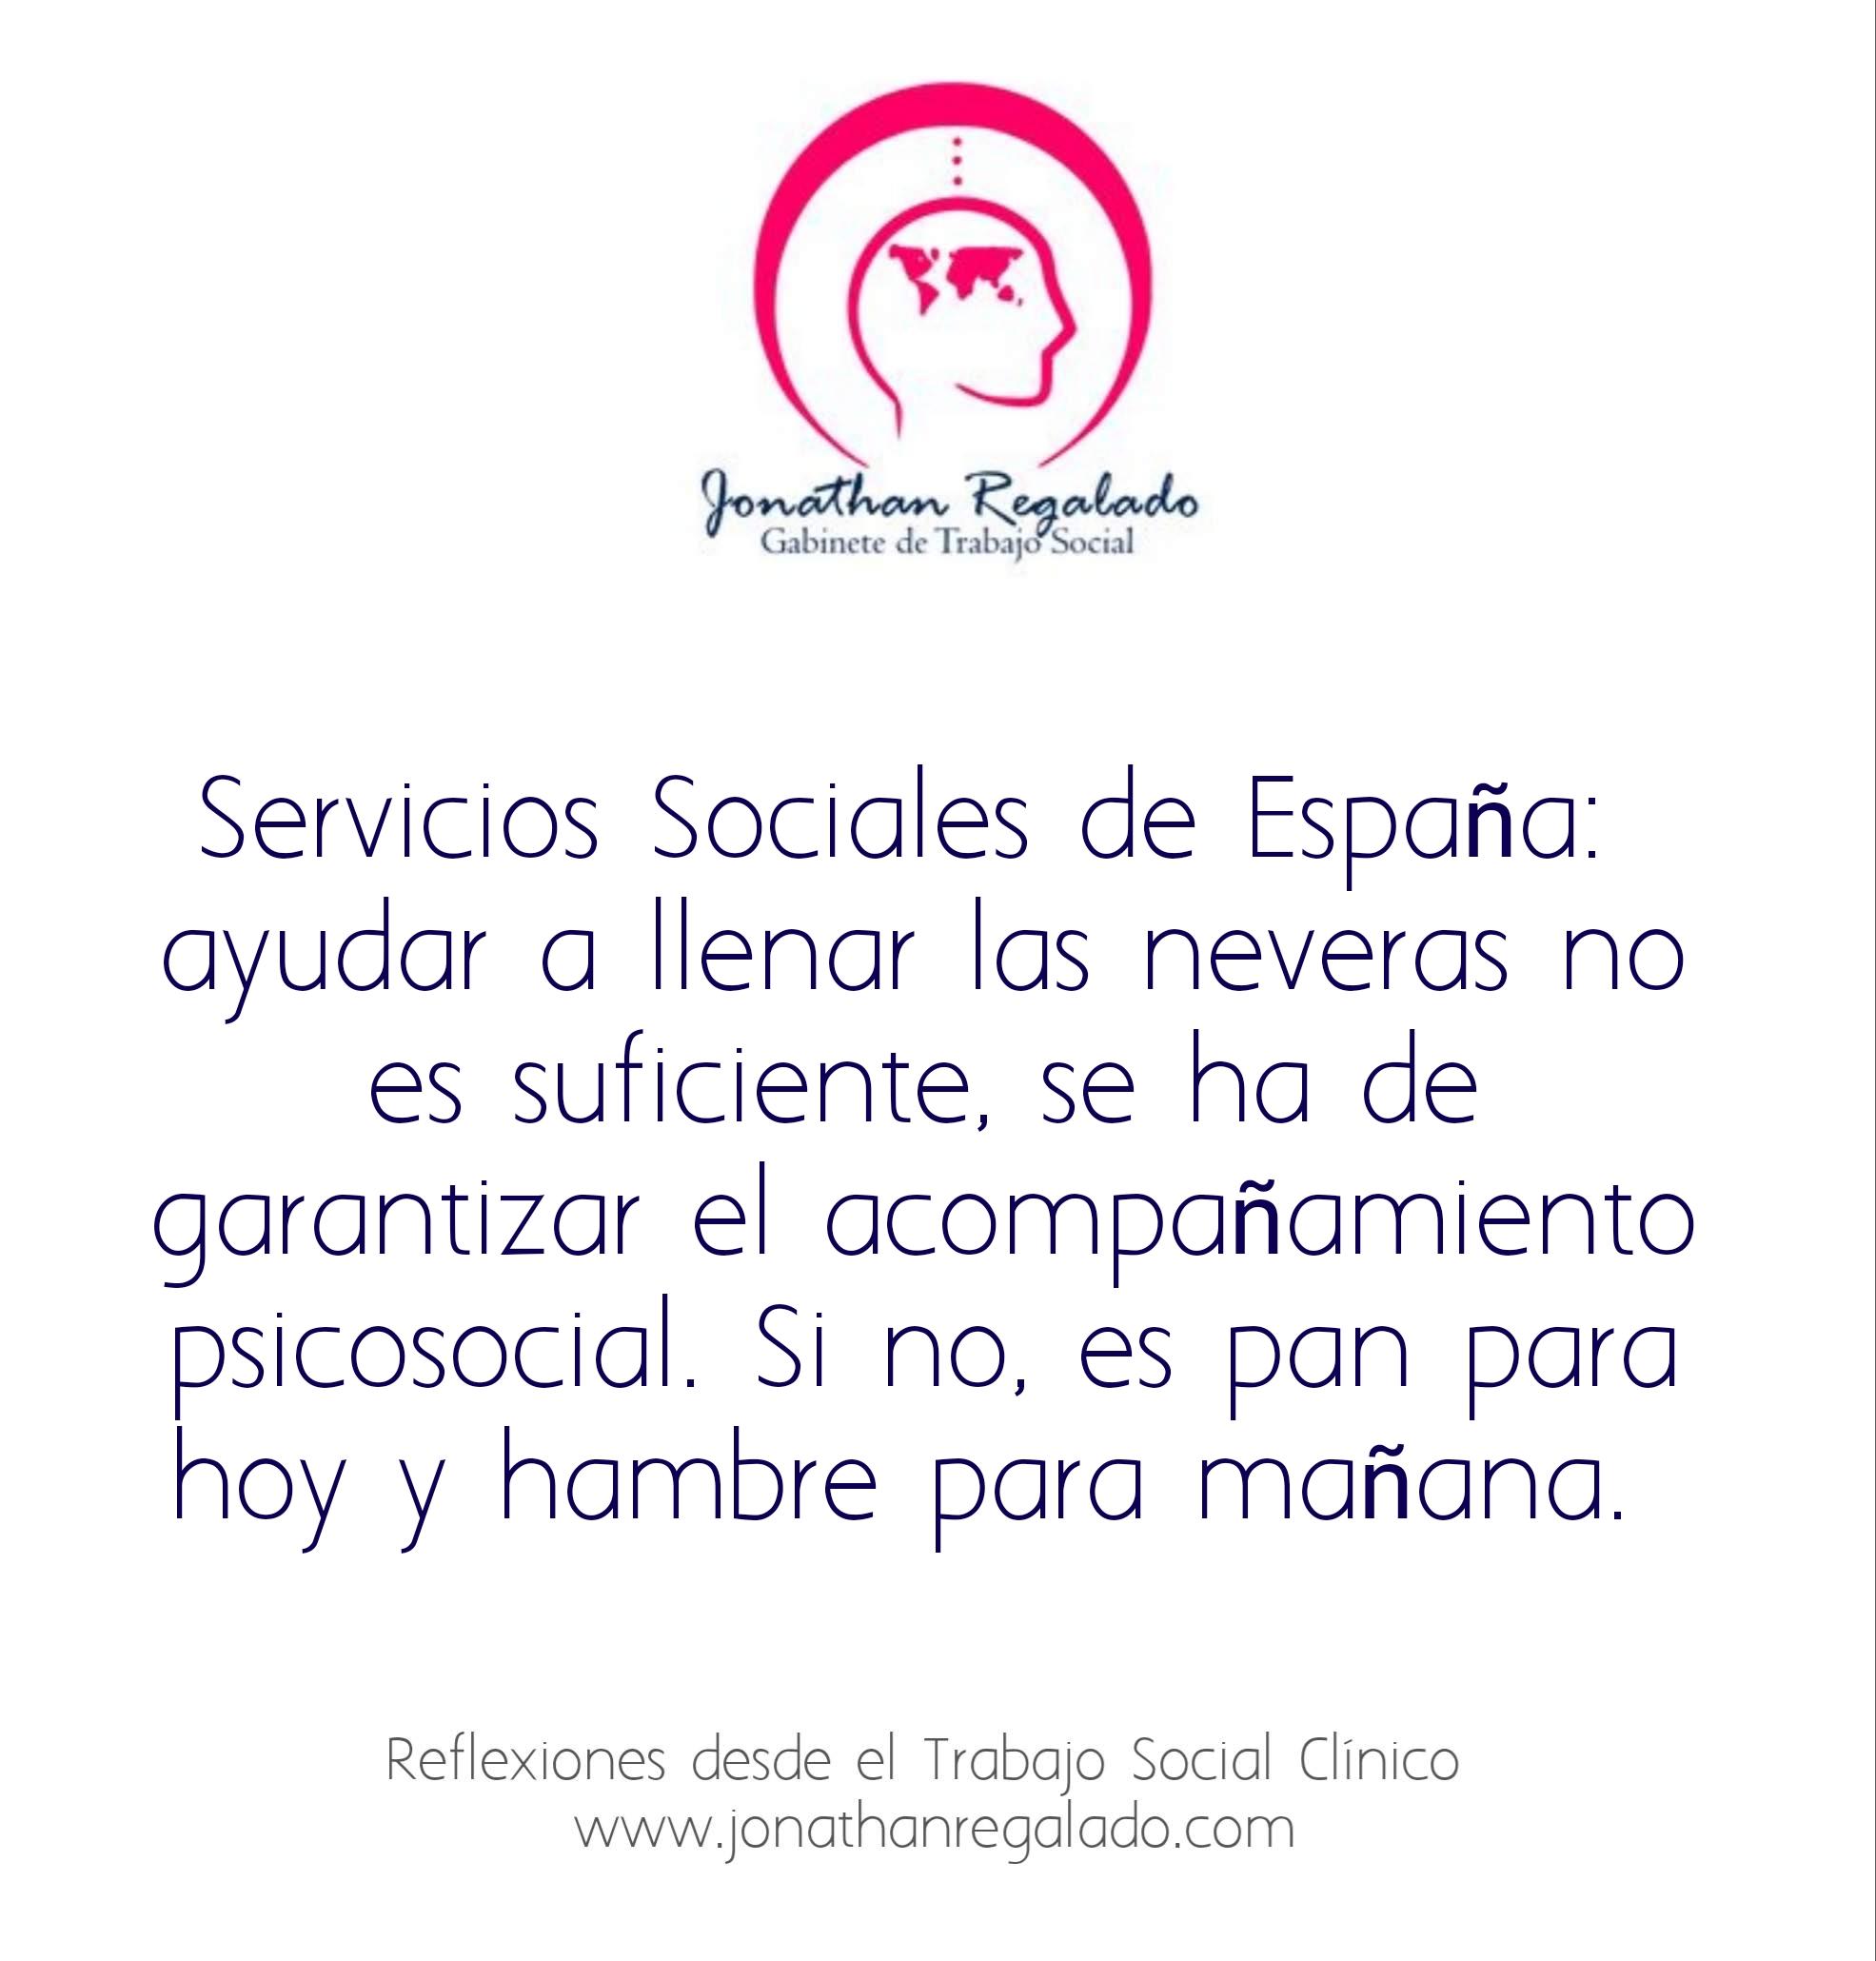 Blanco_20200415220742067